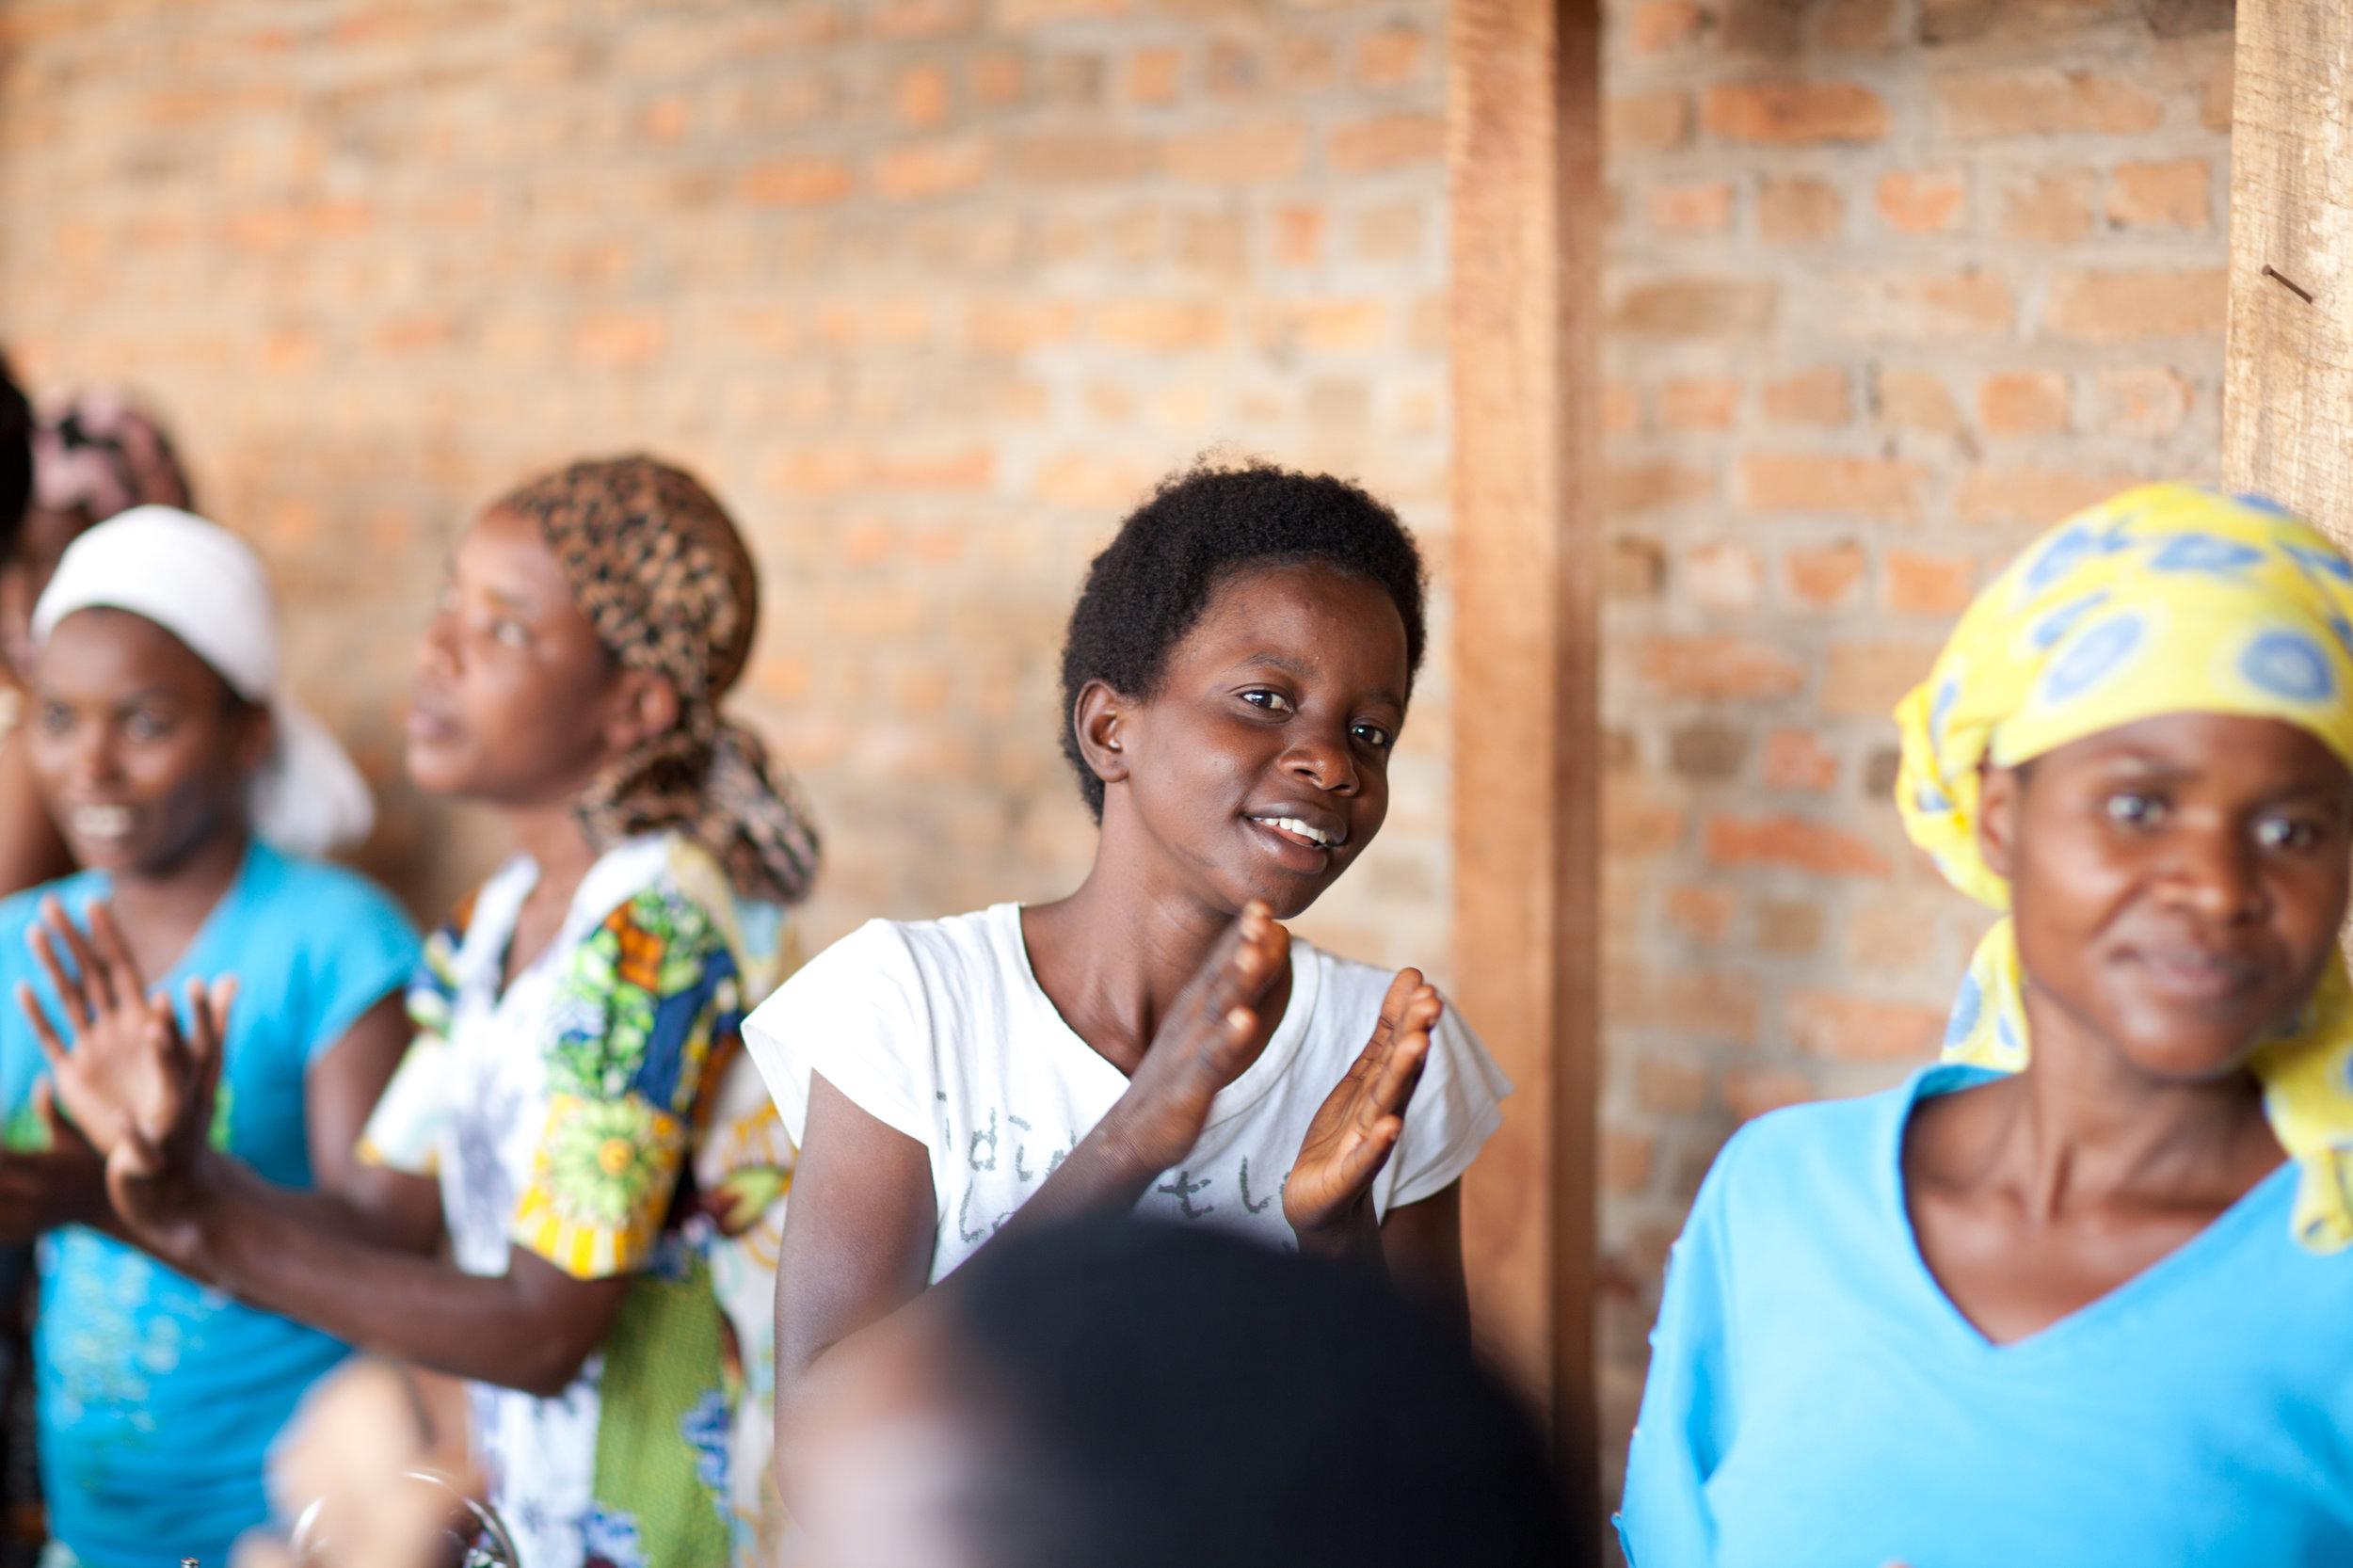 KENYA - Through a three-year skills training and holistic health program, 30 HIV+ widows living in the Kibera Slum of Nairobi receive emotional, physical, spiritual and psychological support.